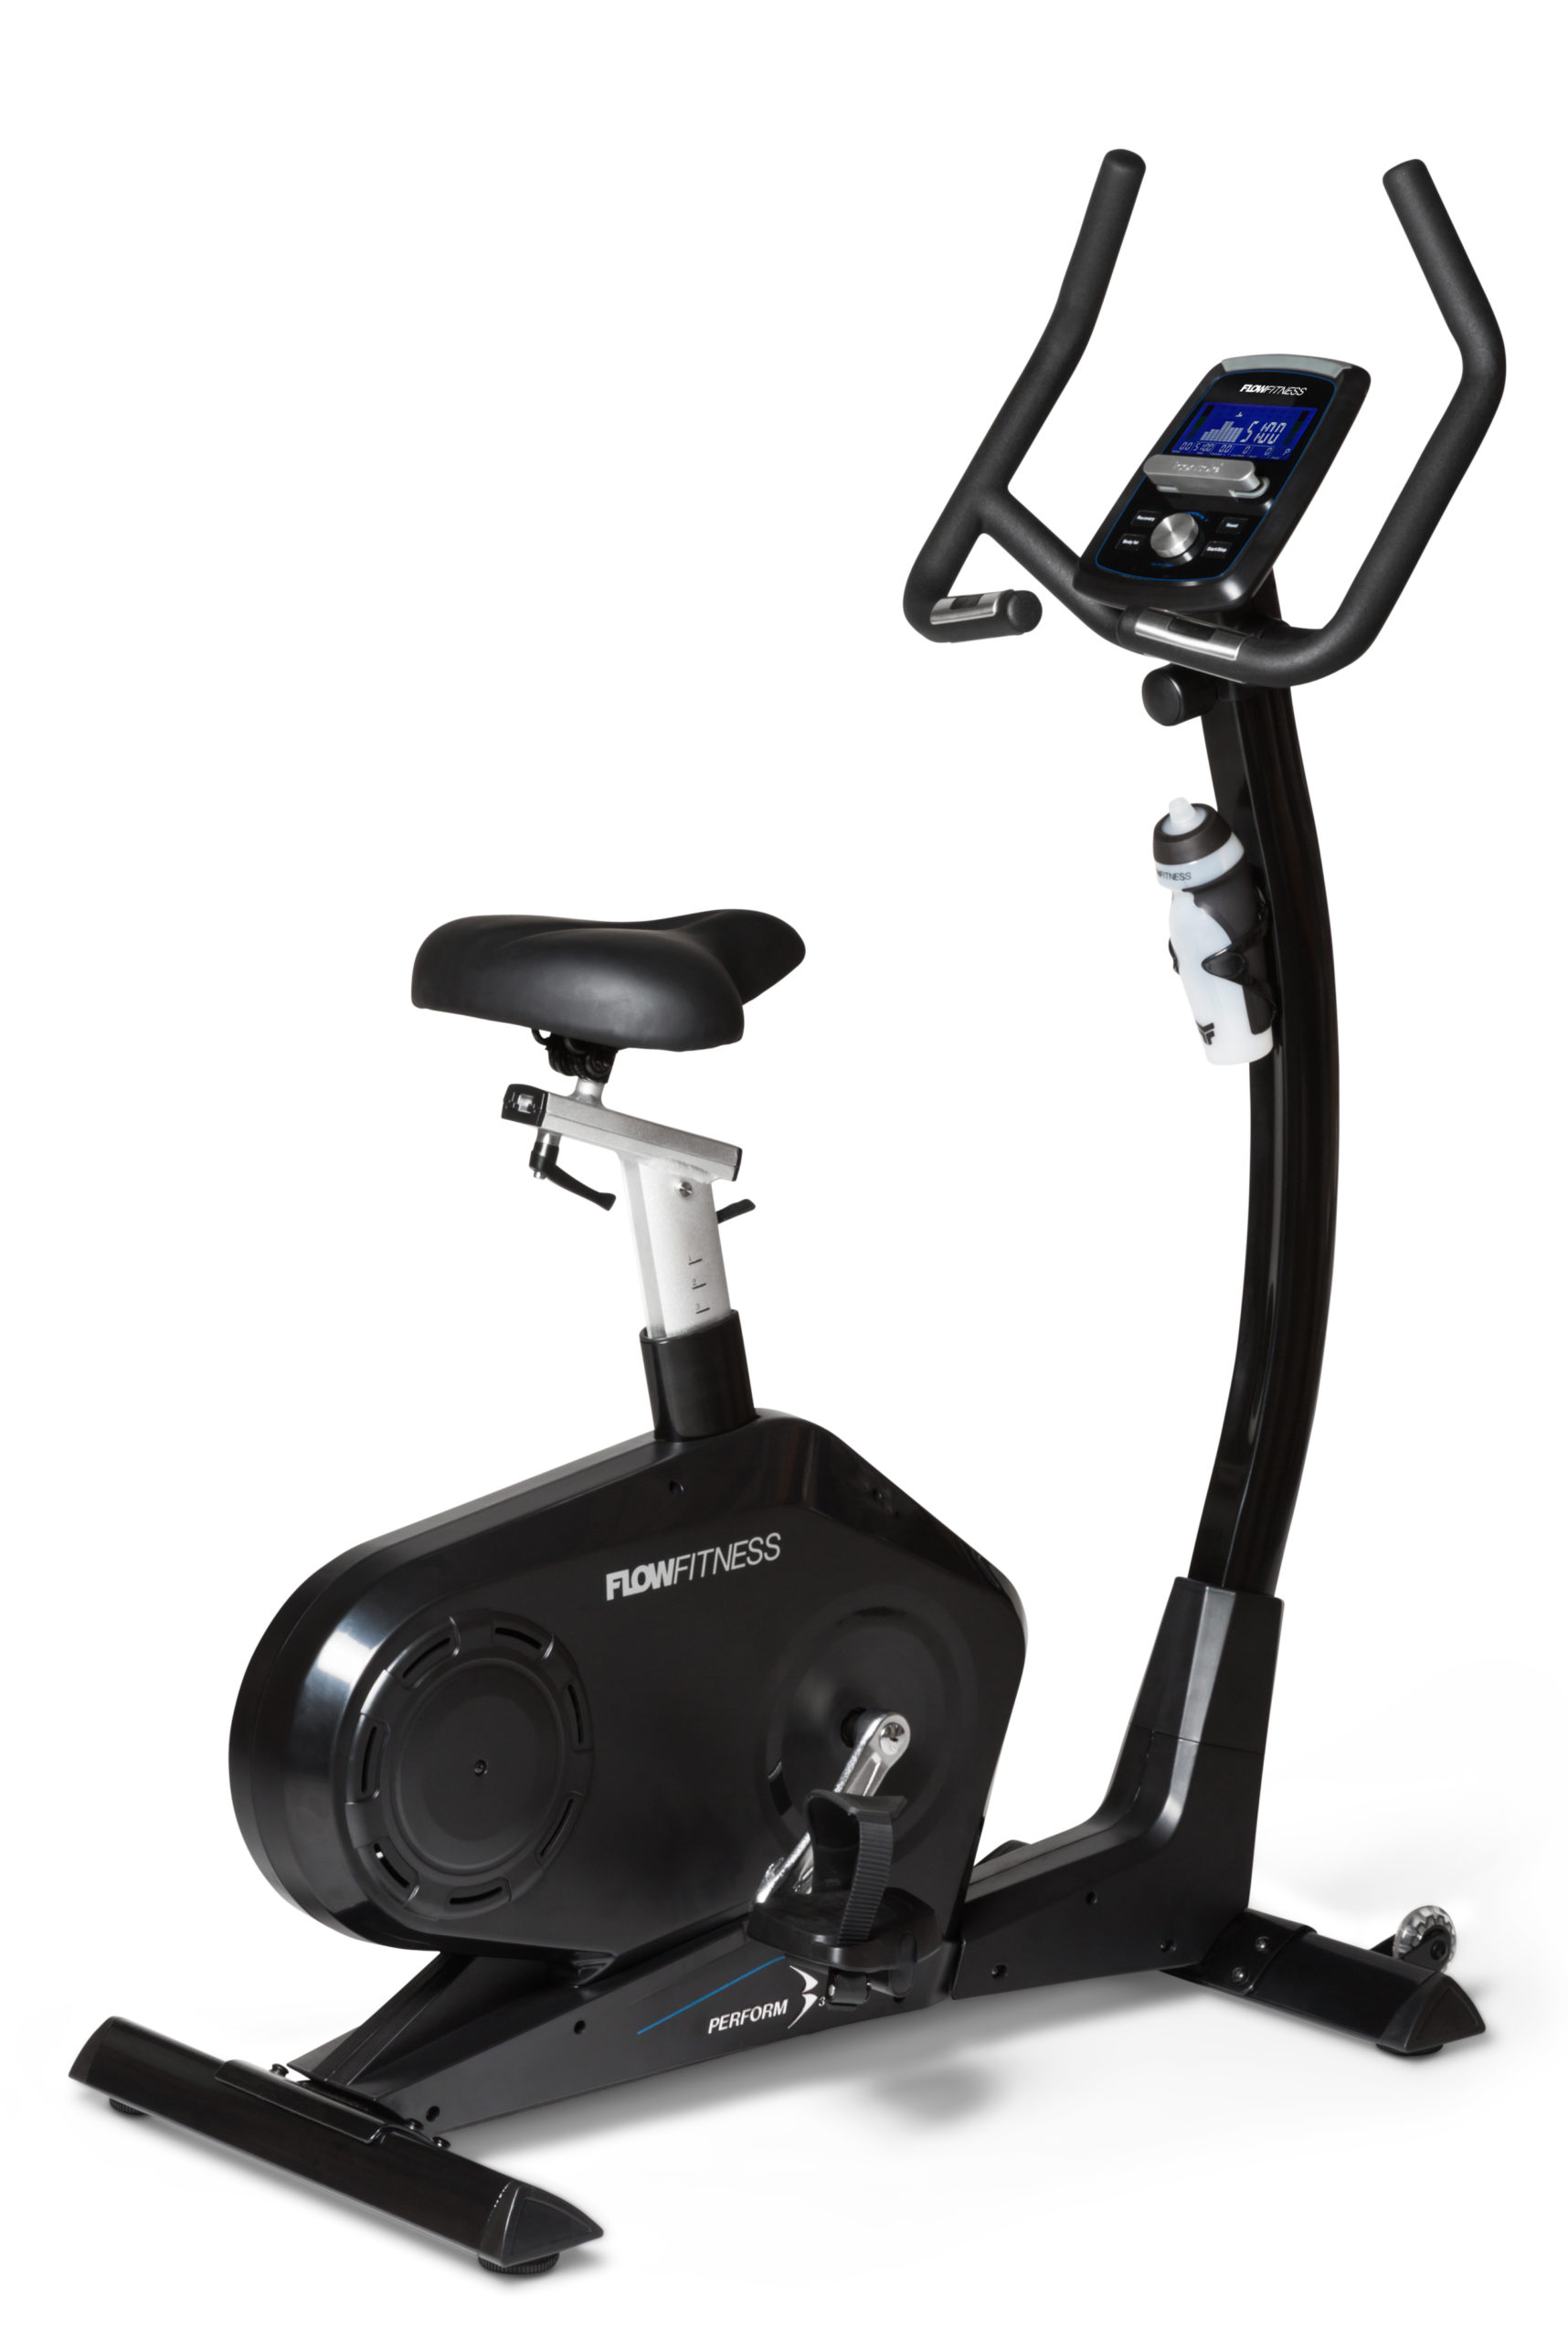 Flow Fitness Tabel PERFORM B3i Ergometer 1